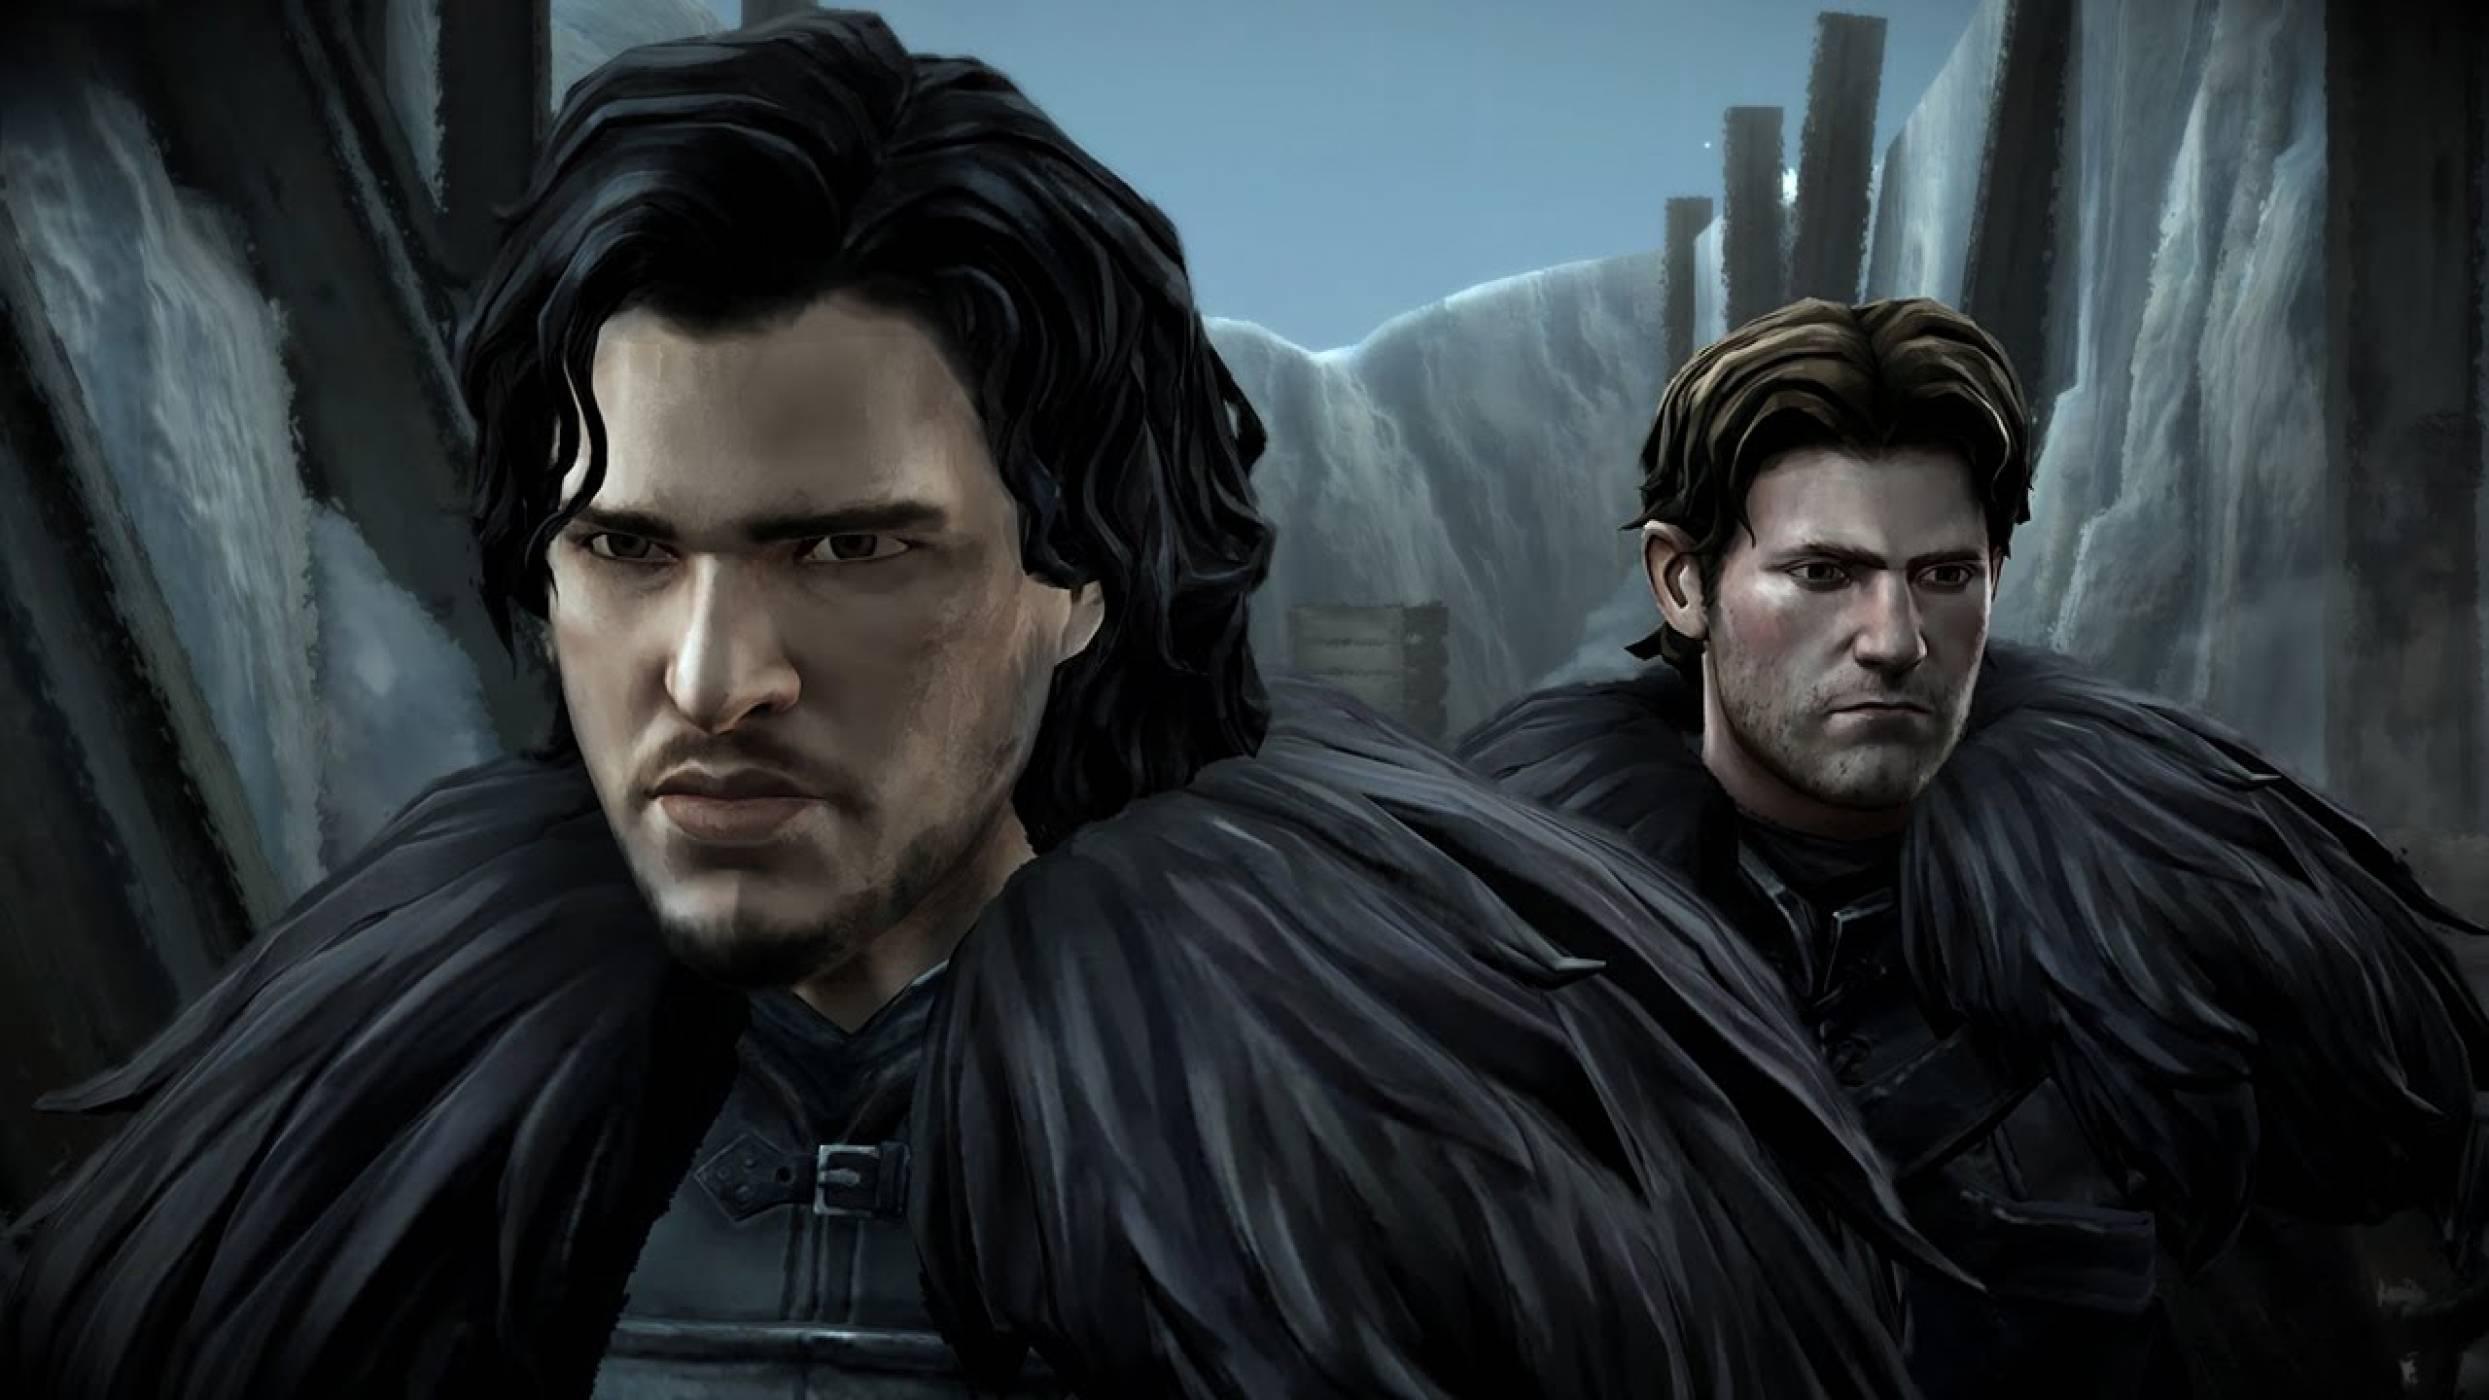 Играта на Bethesda по Game of Thrones засега изглежда само страхотен слух